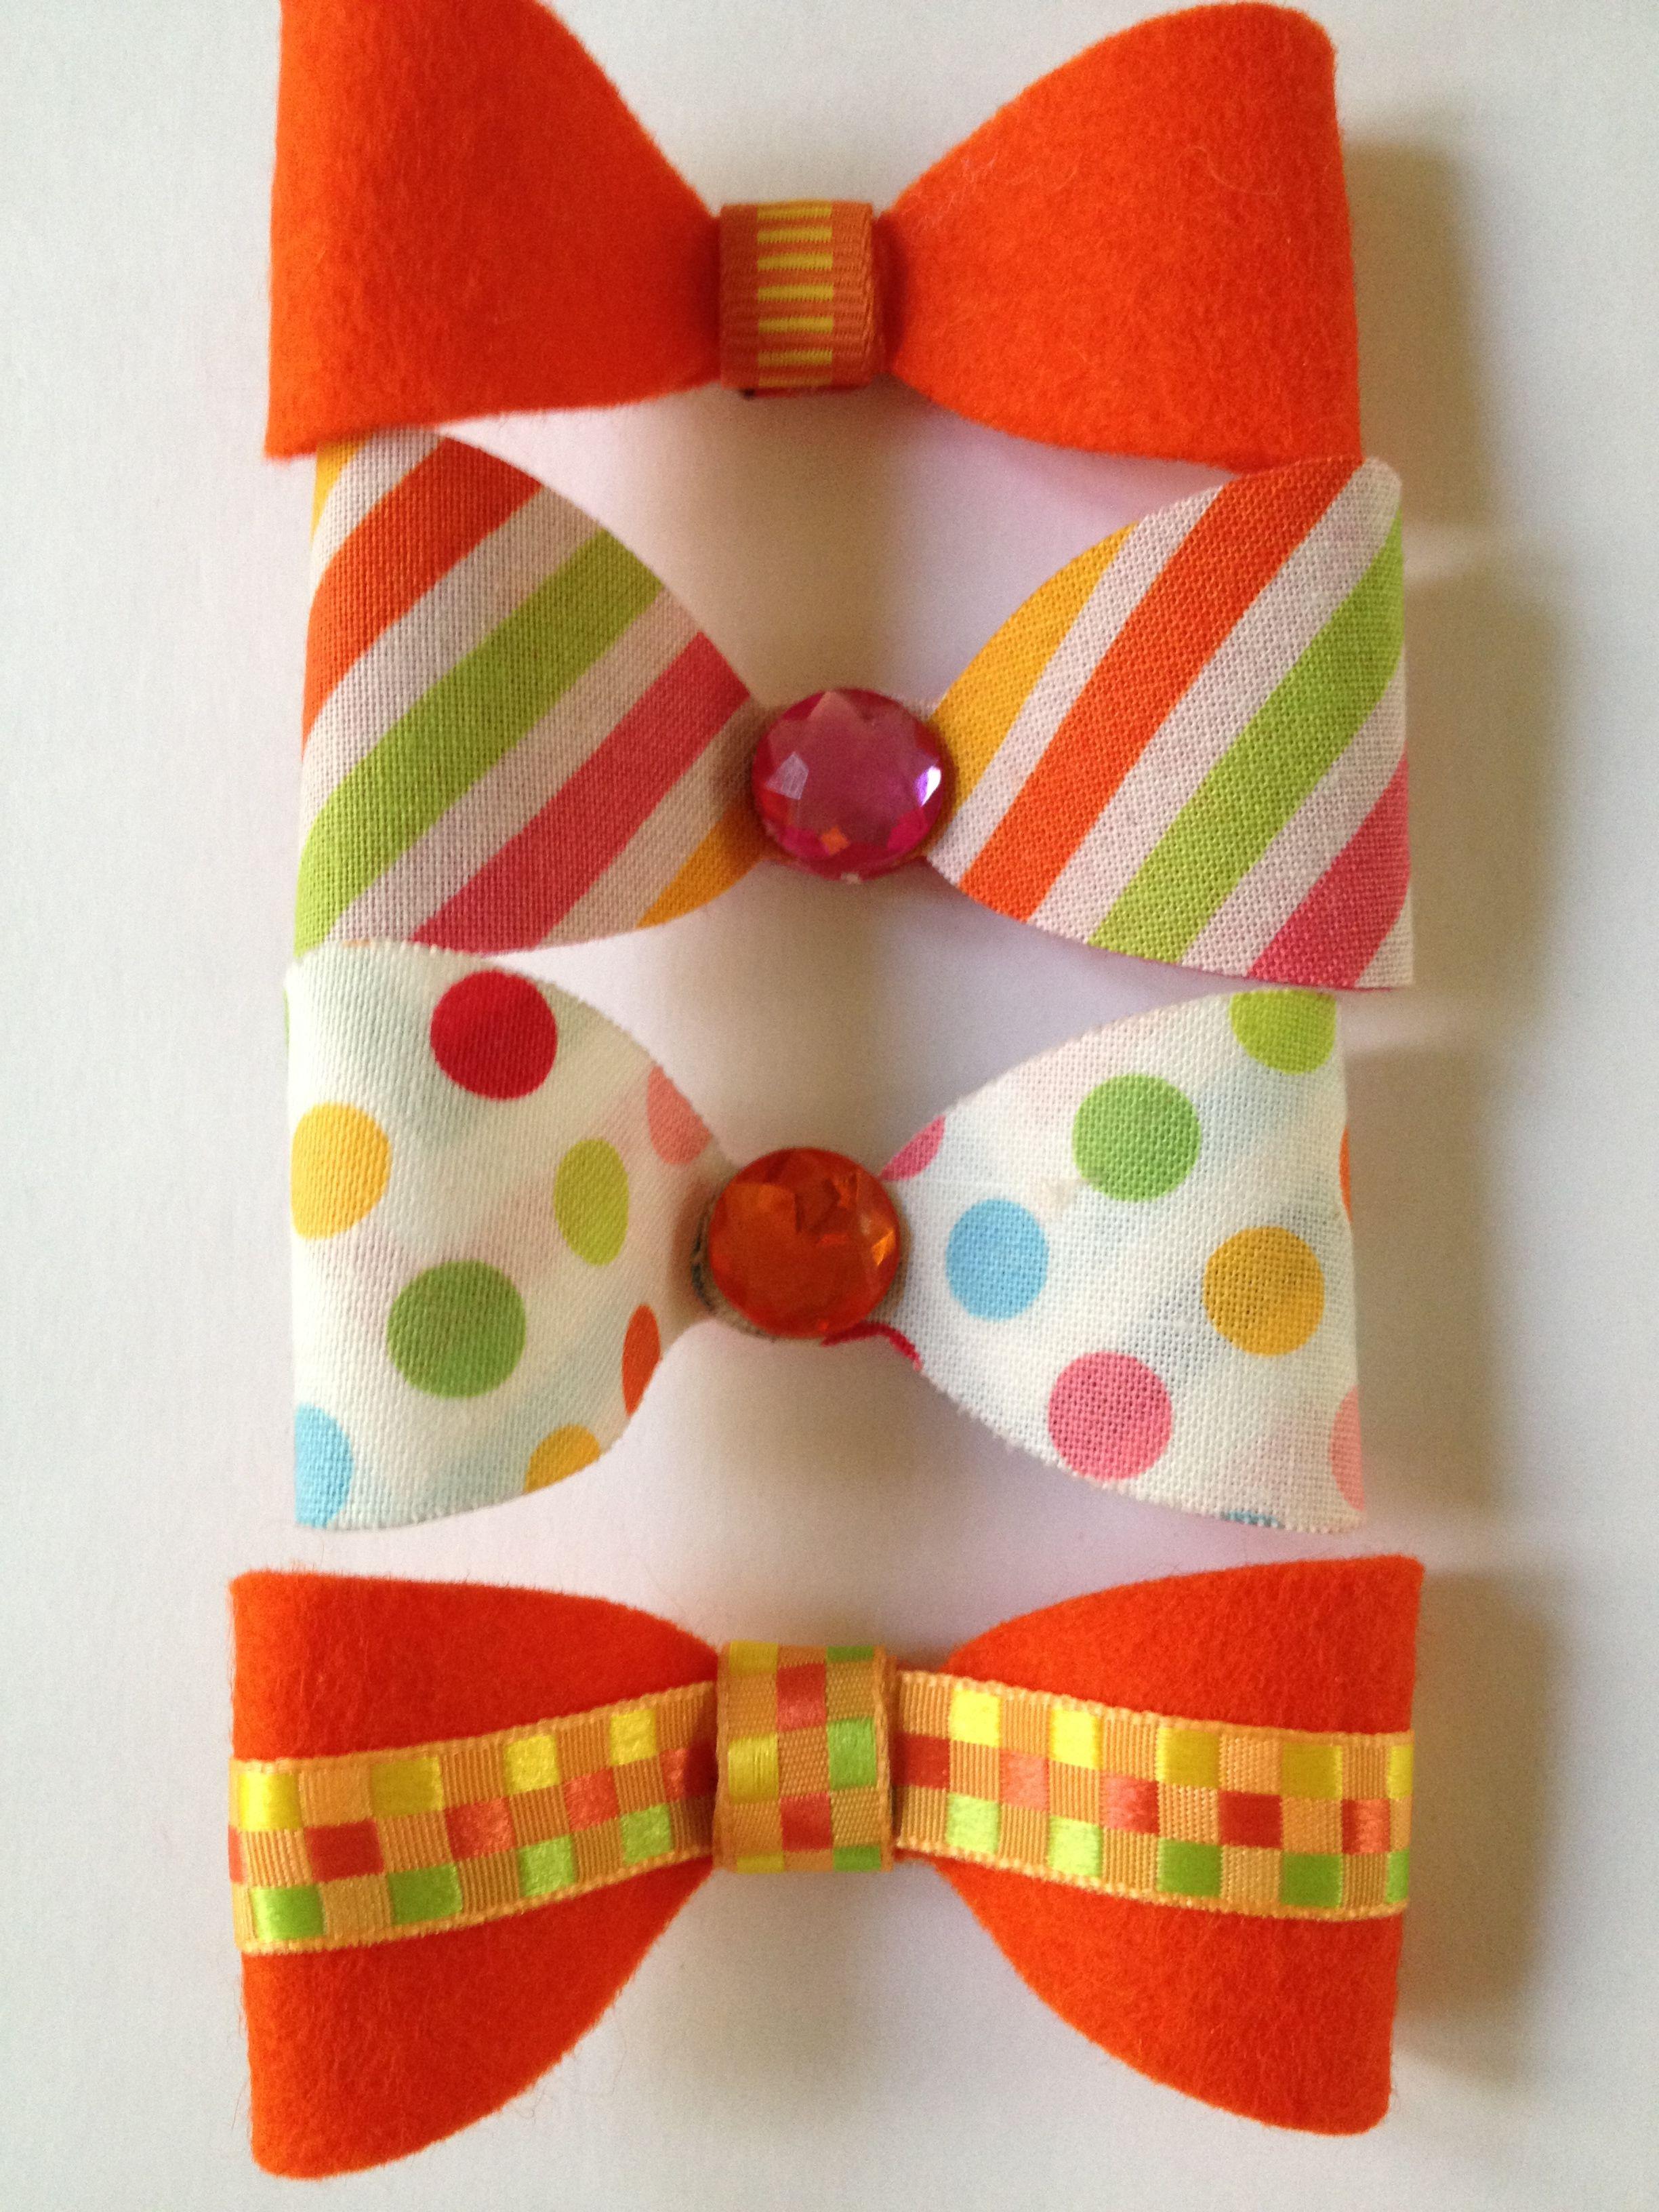 Felt and fabric bows